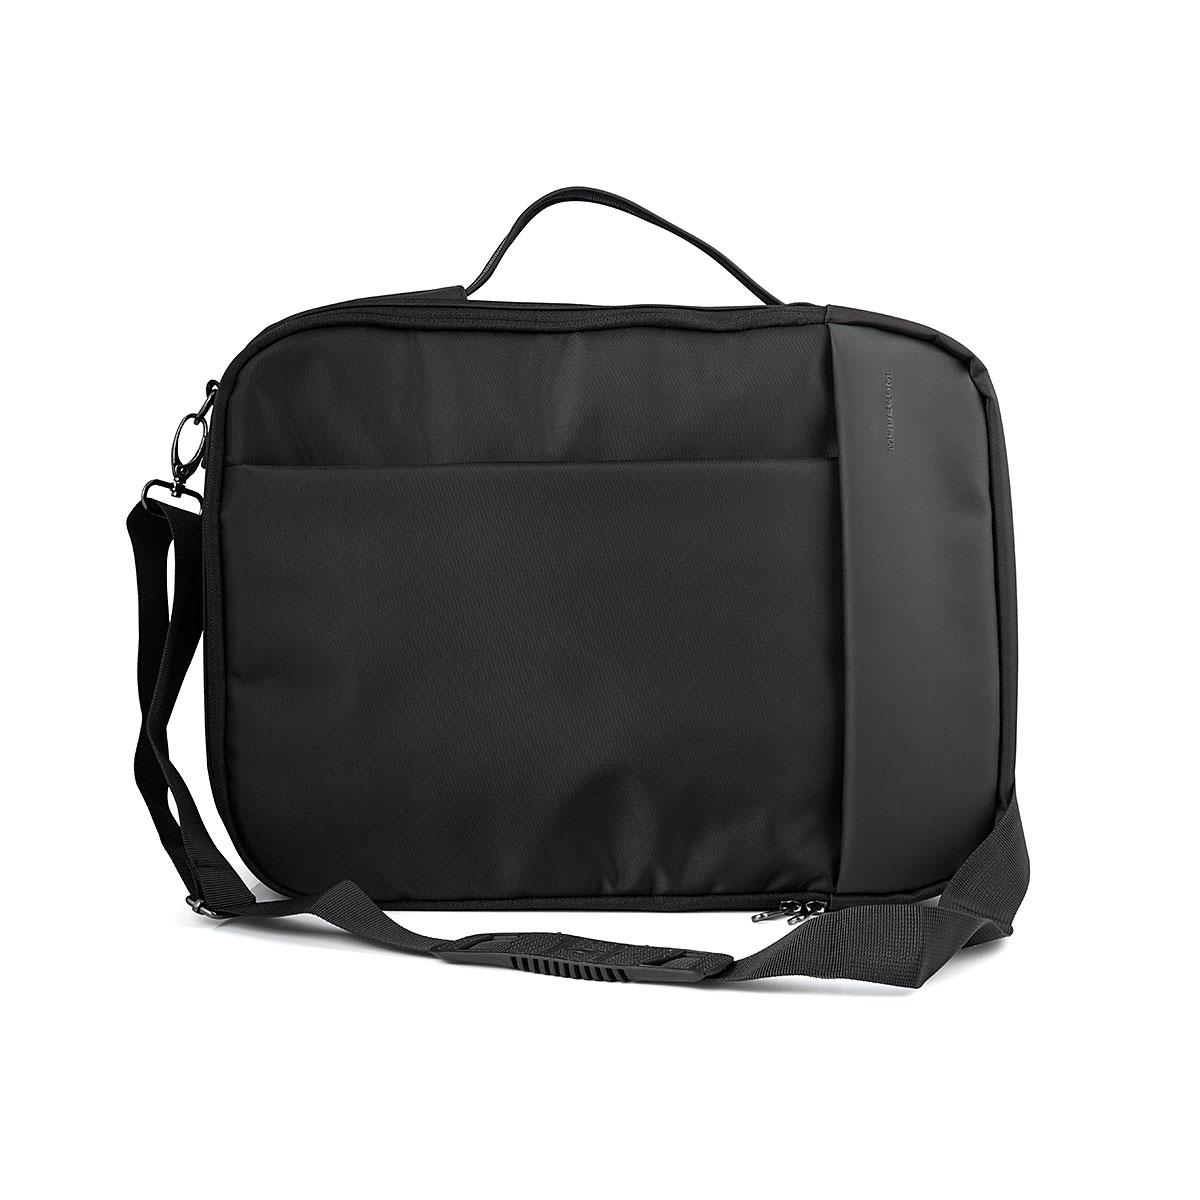 Geanta Laptop Modecom Trenton 15.6 Negru